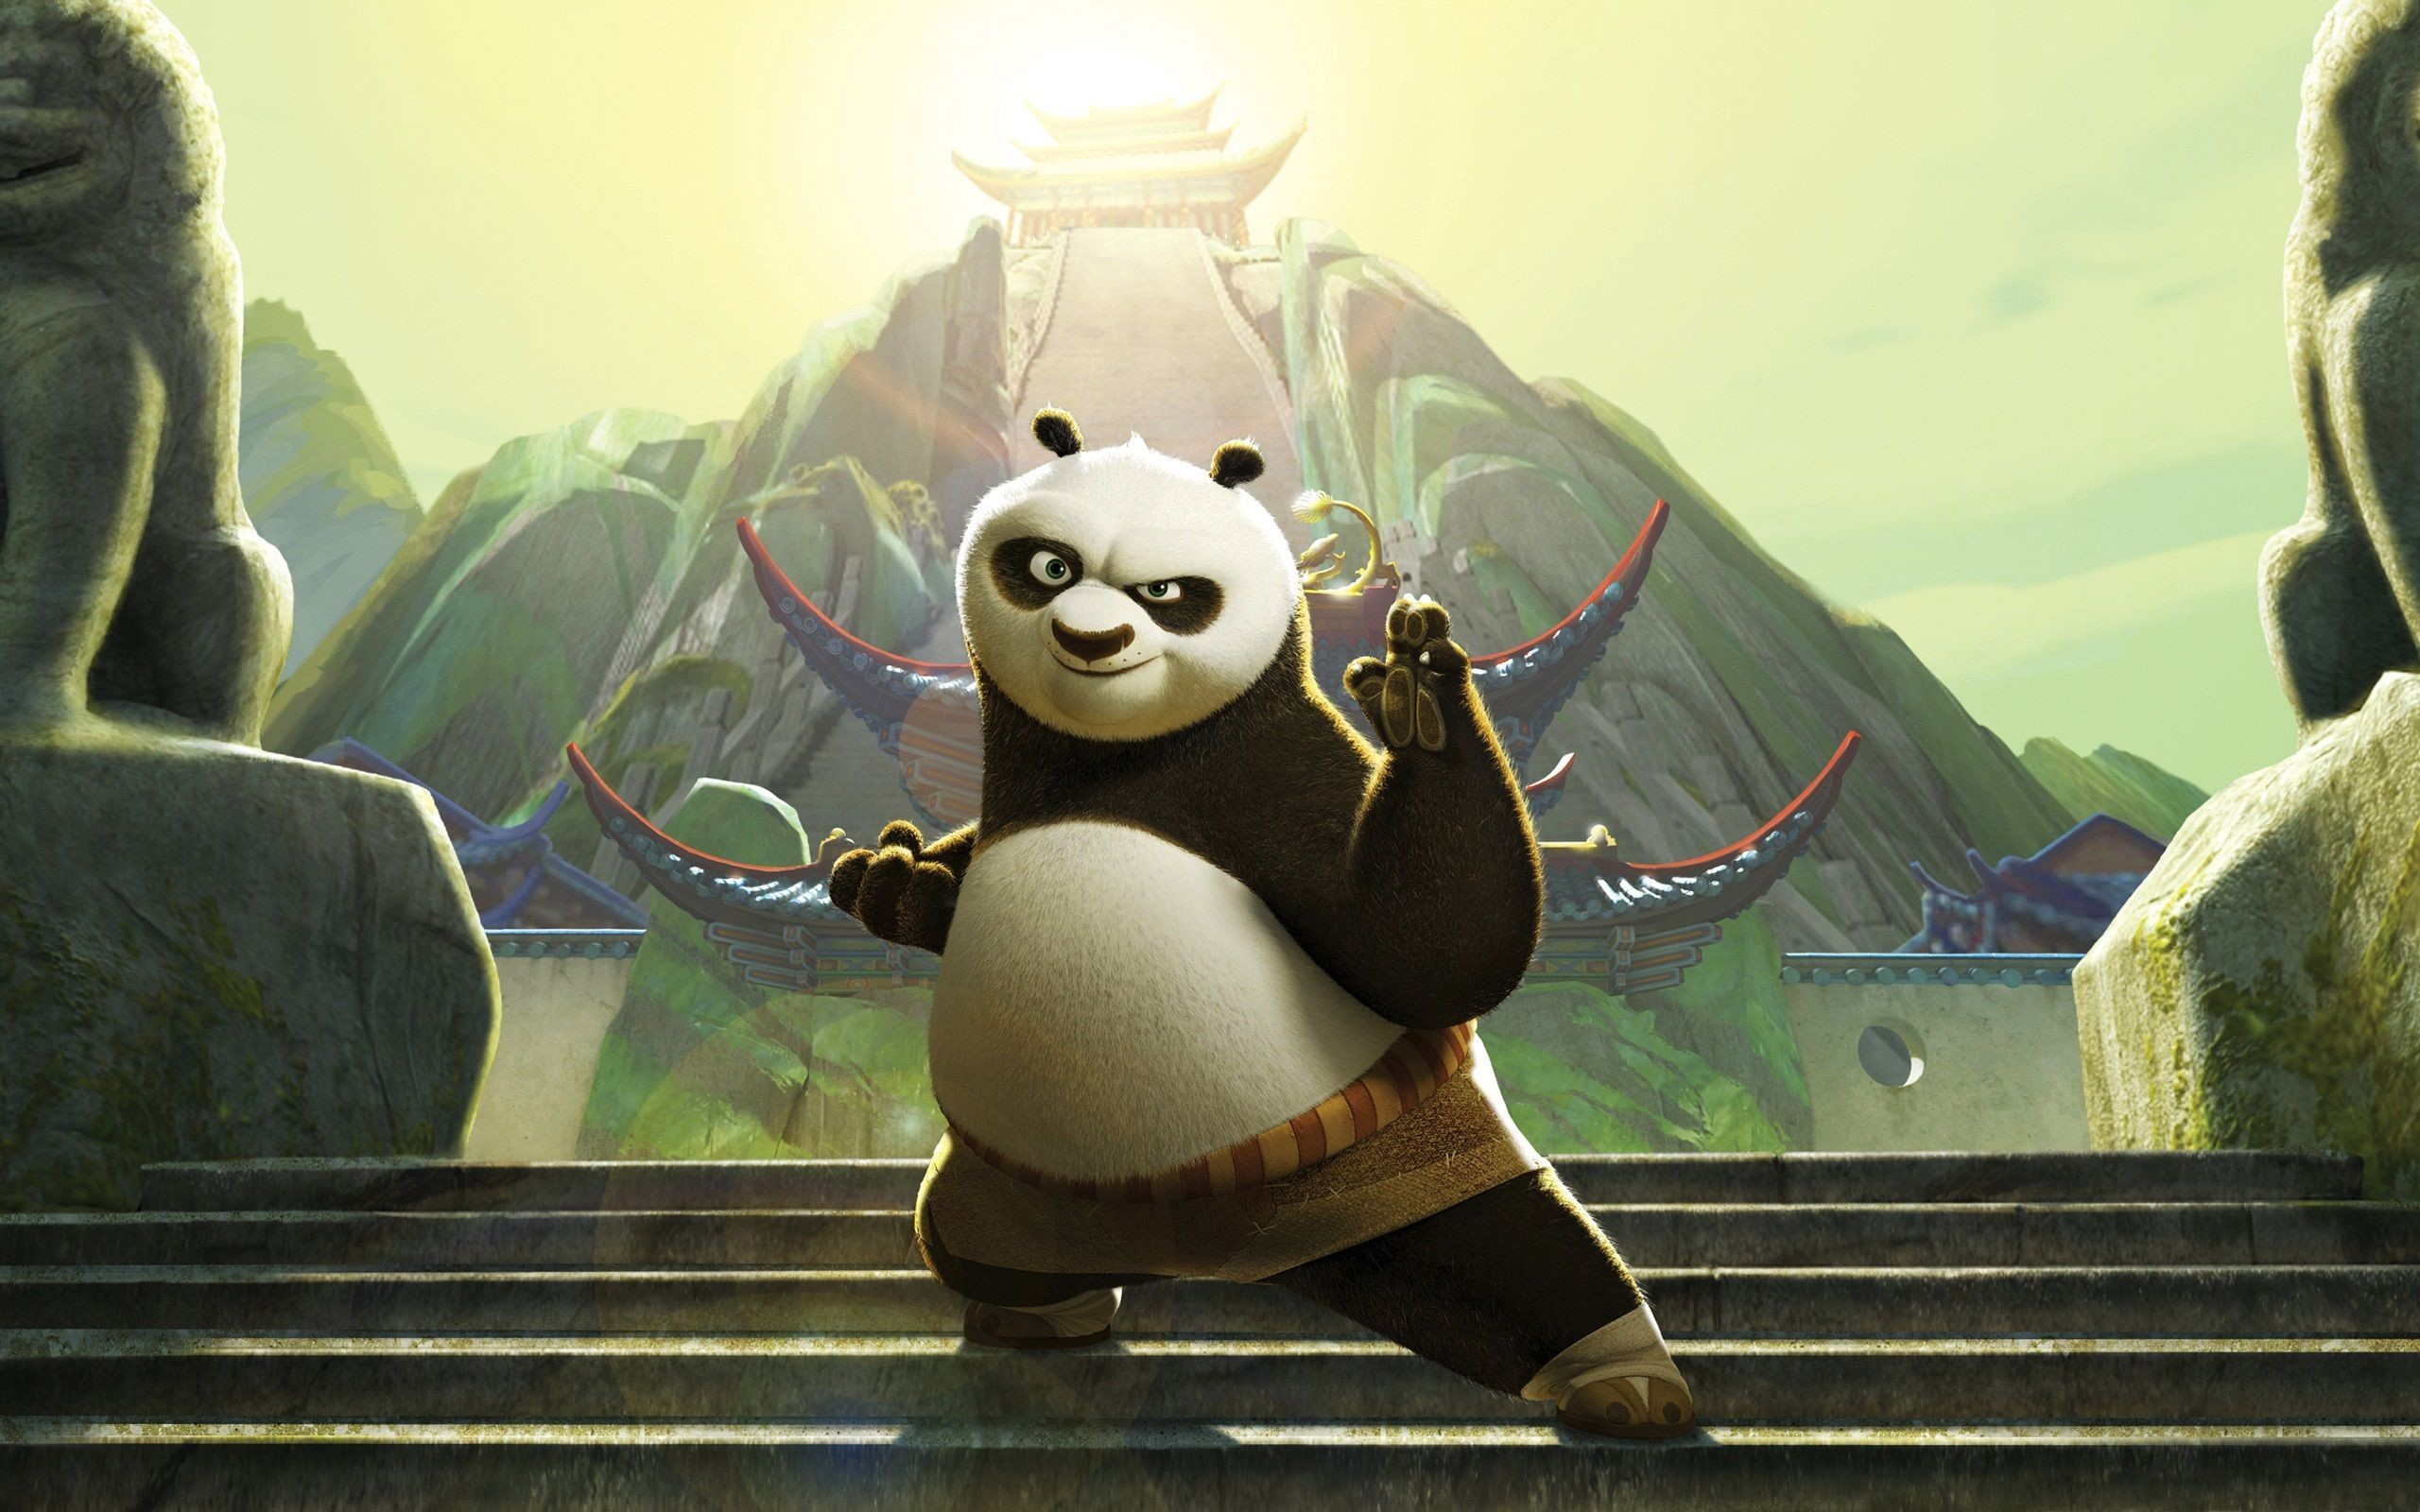 Kung Fu Panda 1 & 2 HD Movie Wallpapers – Page 1